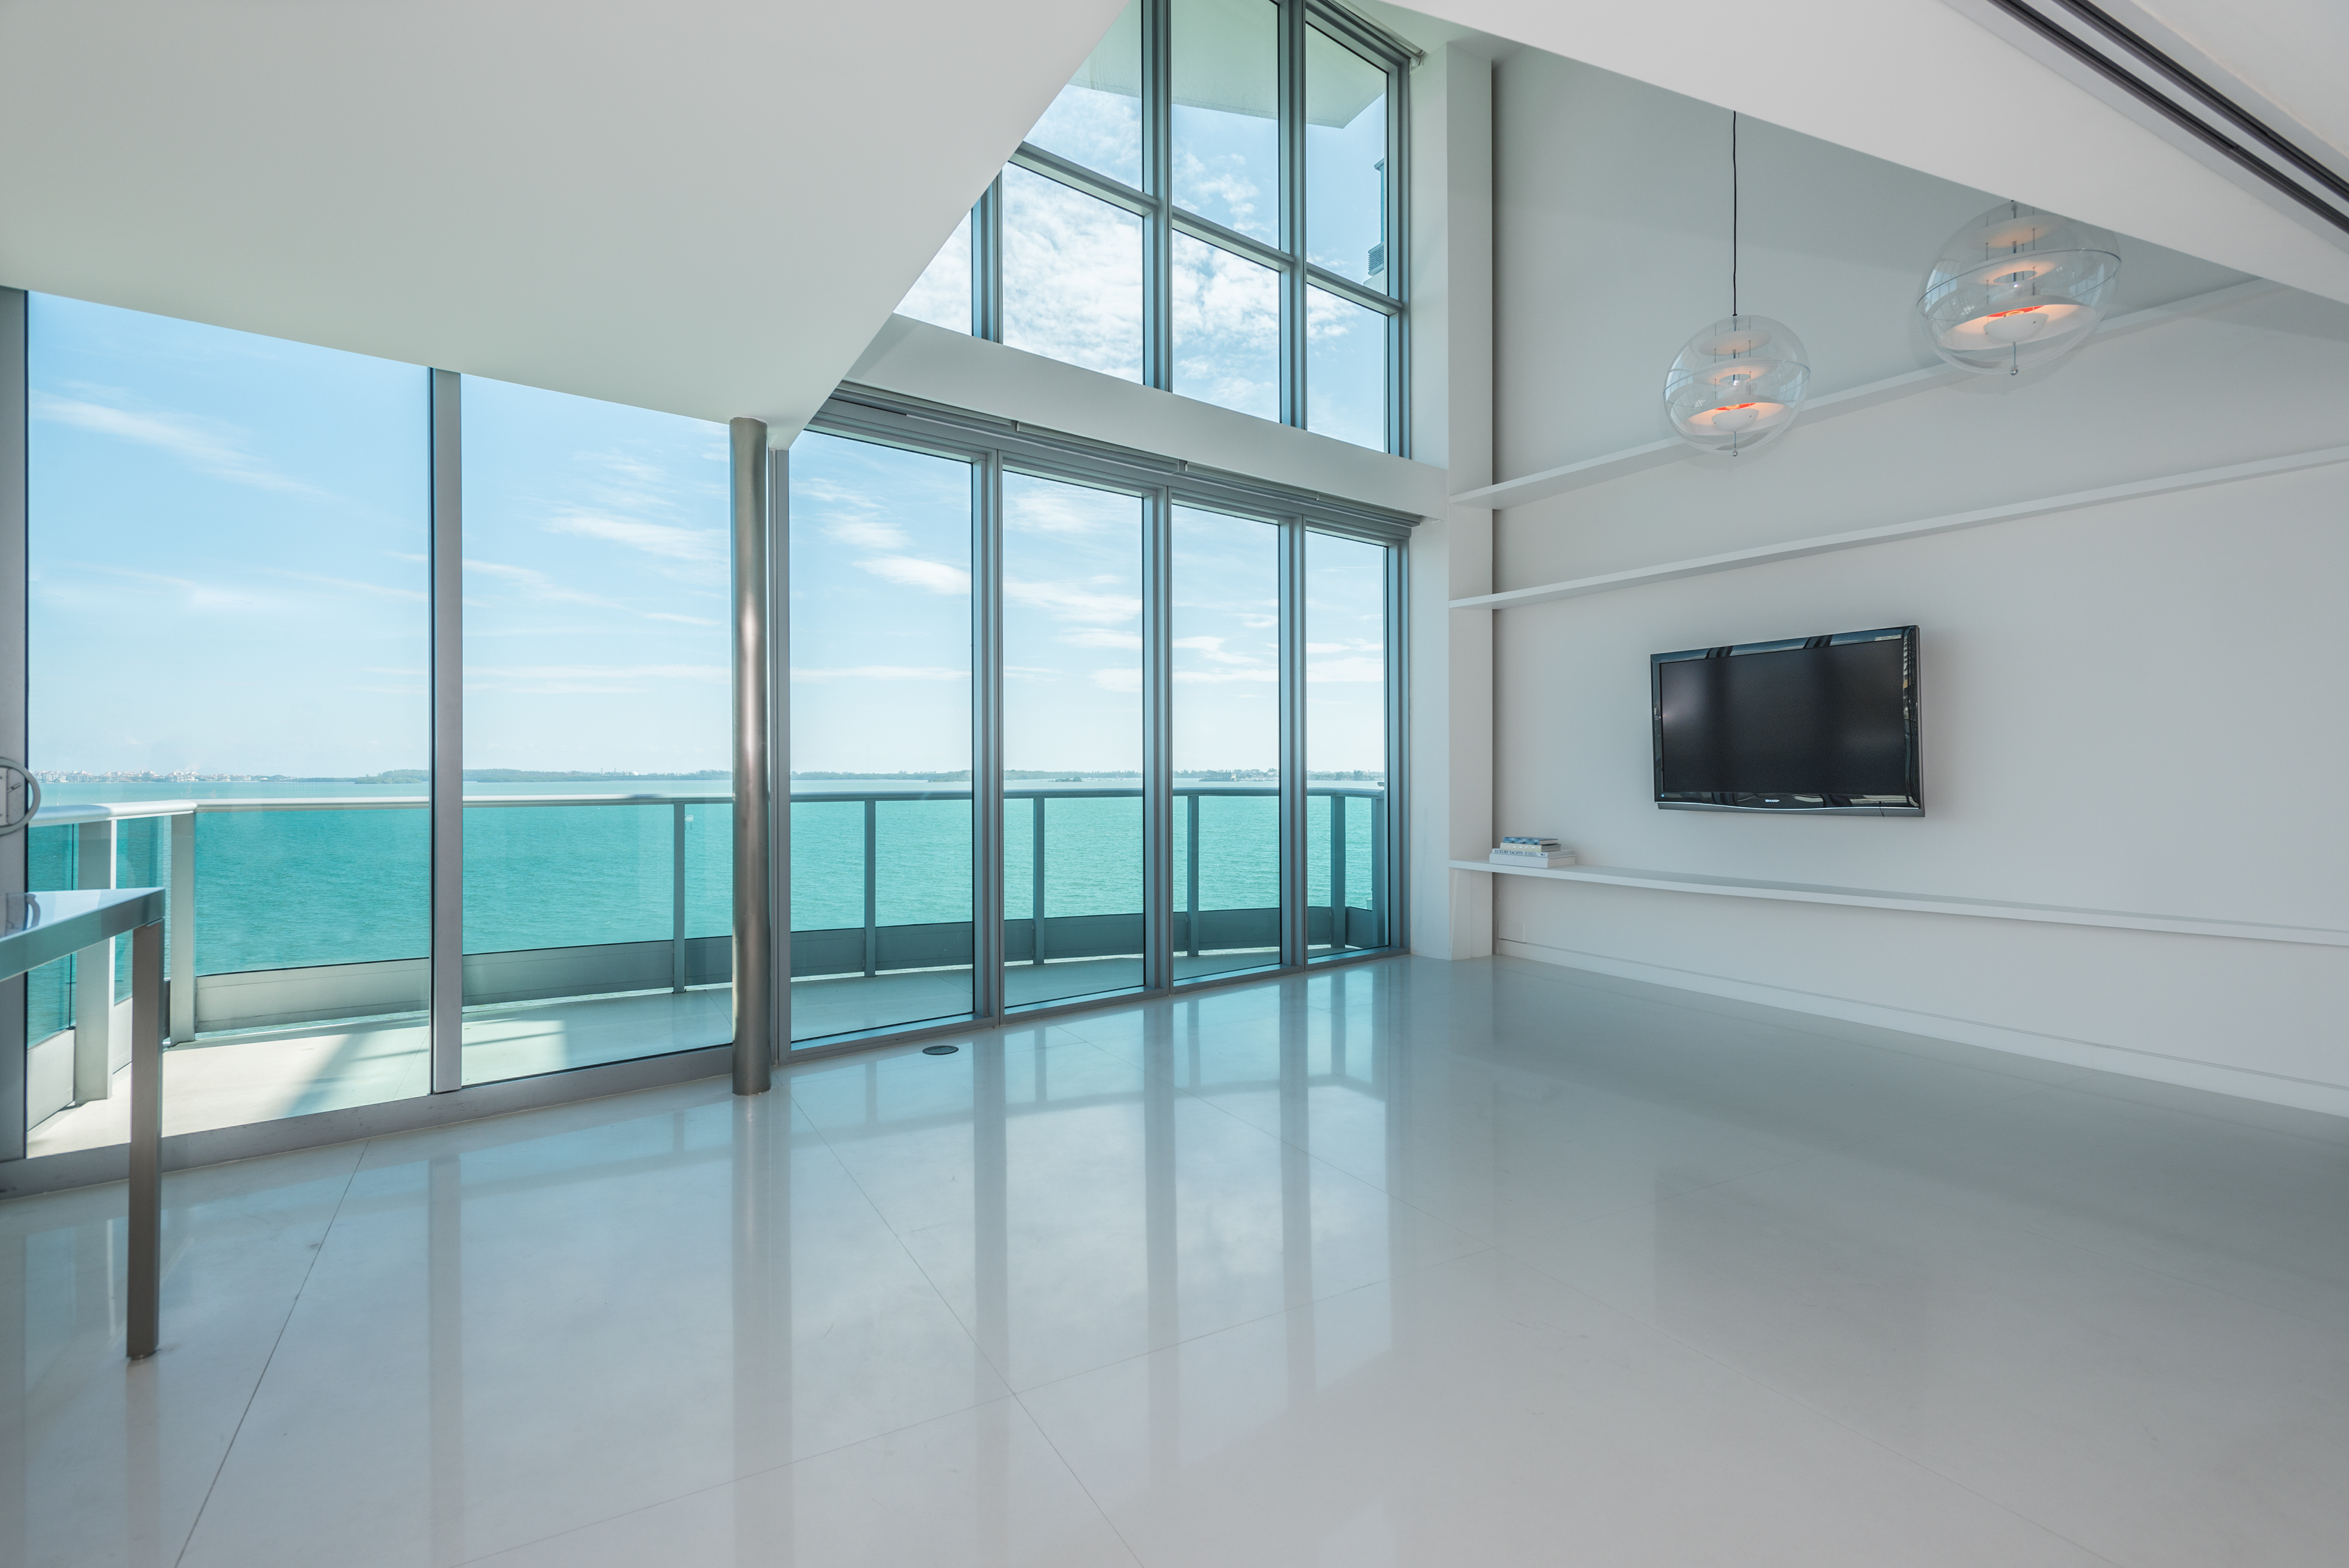 Condominium for Sale at 1331 Brickell Bay Dr #Bl46 1331 Brickell Bay Dr BL46 Miami, Florida, 33131 United States